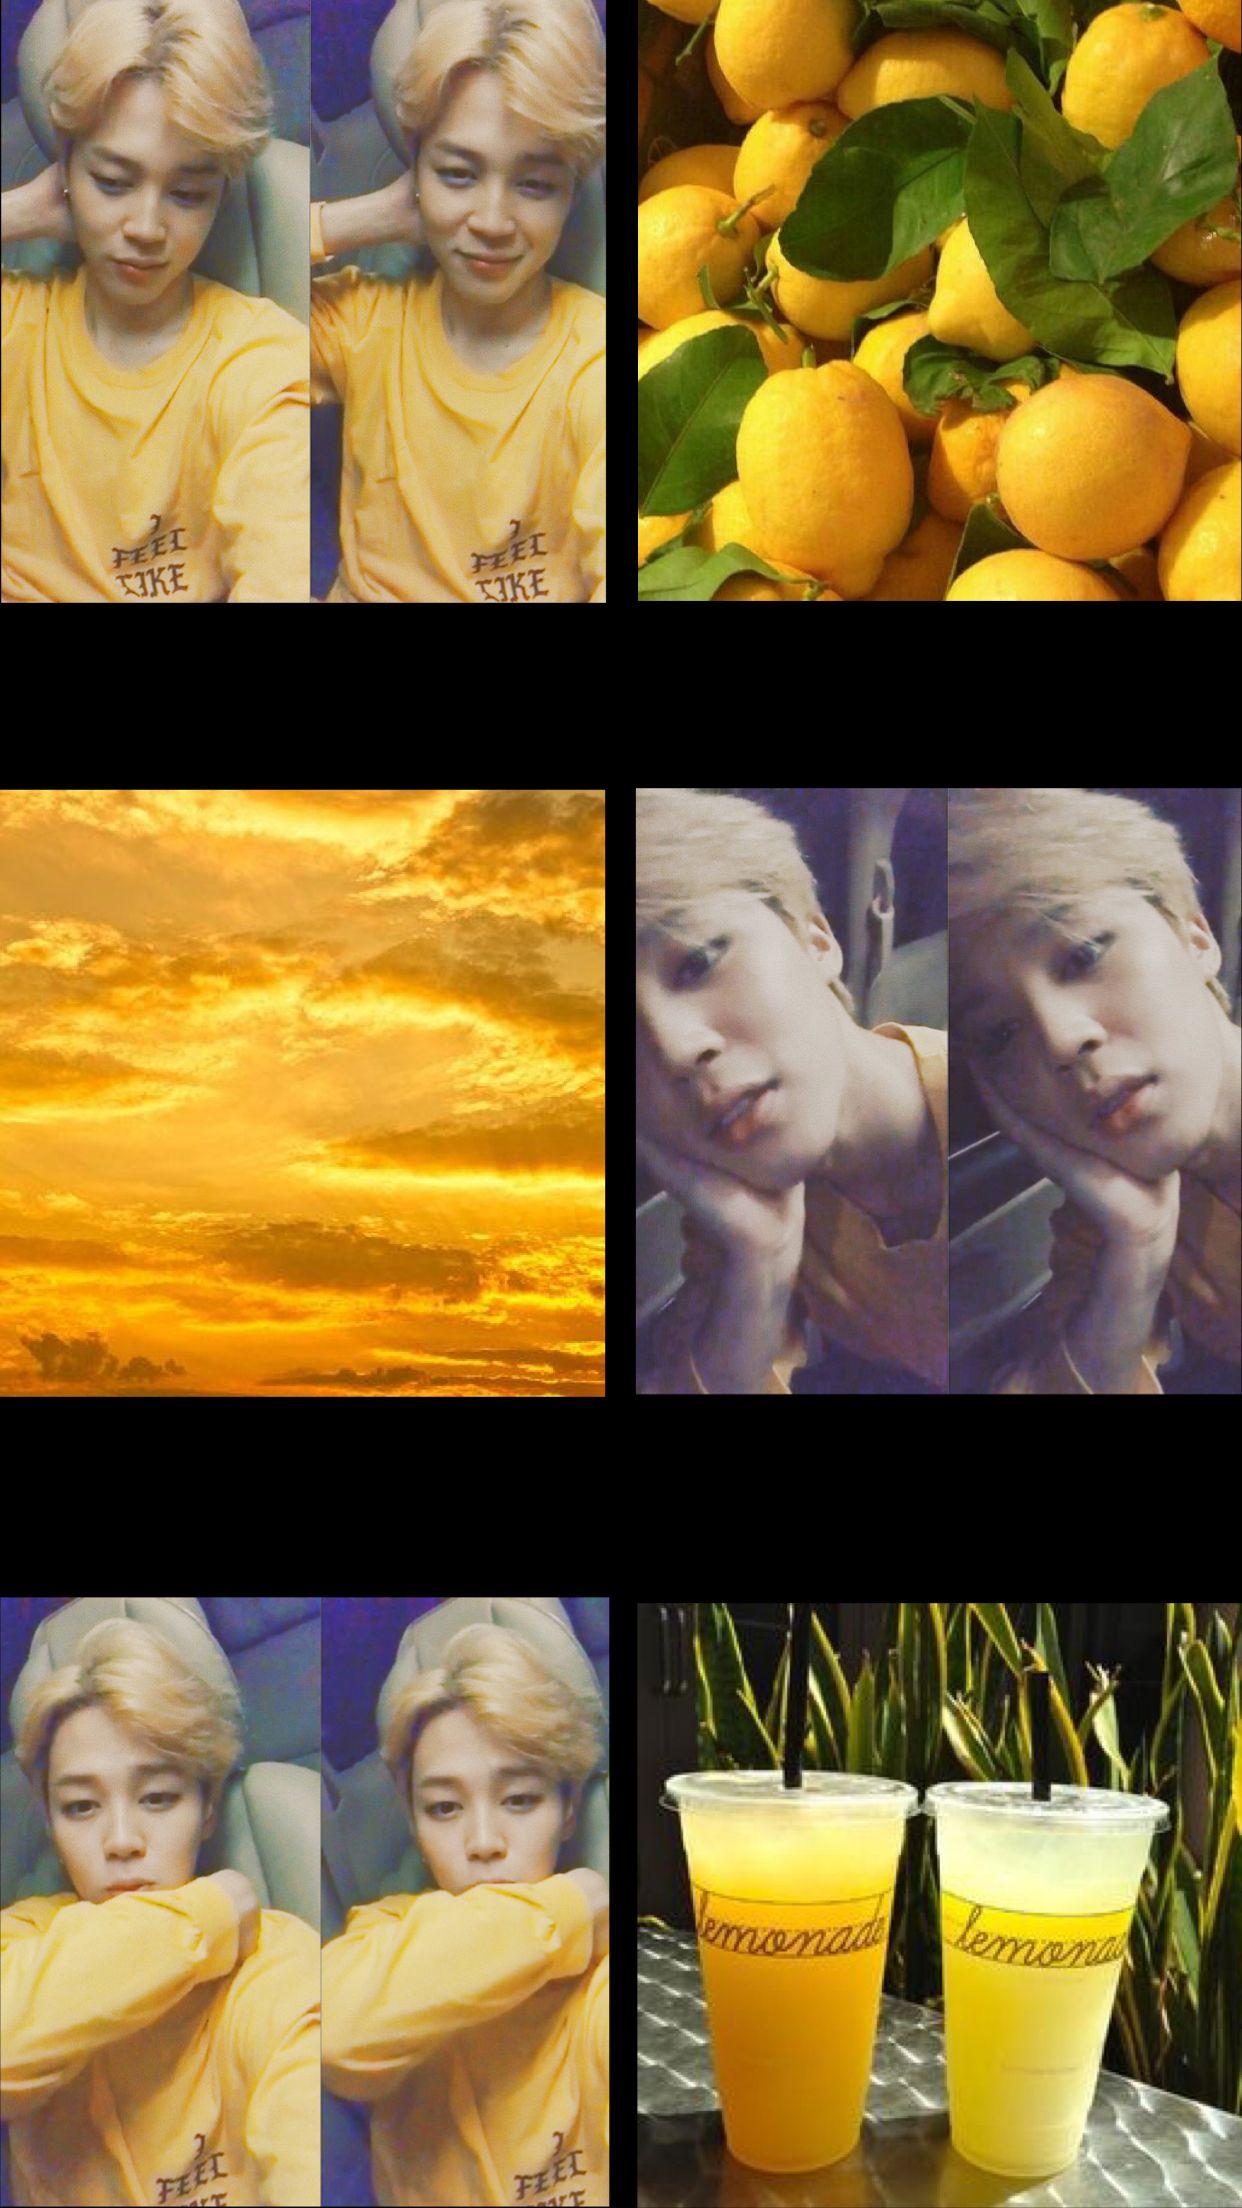 Bts Jimin Wallpaper Edit Yellow Aesthetic Kpop At Luxuxiwoo